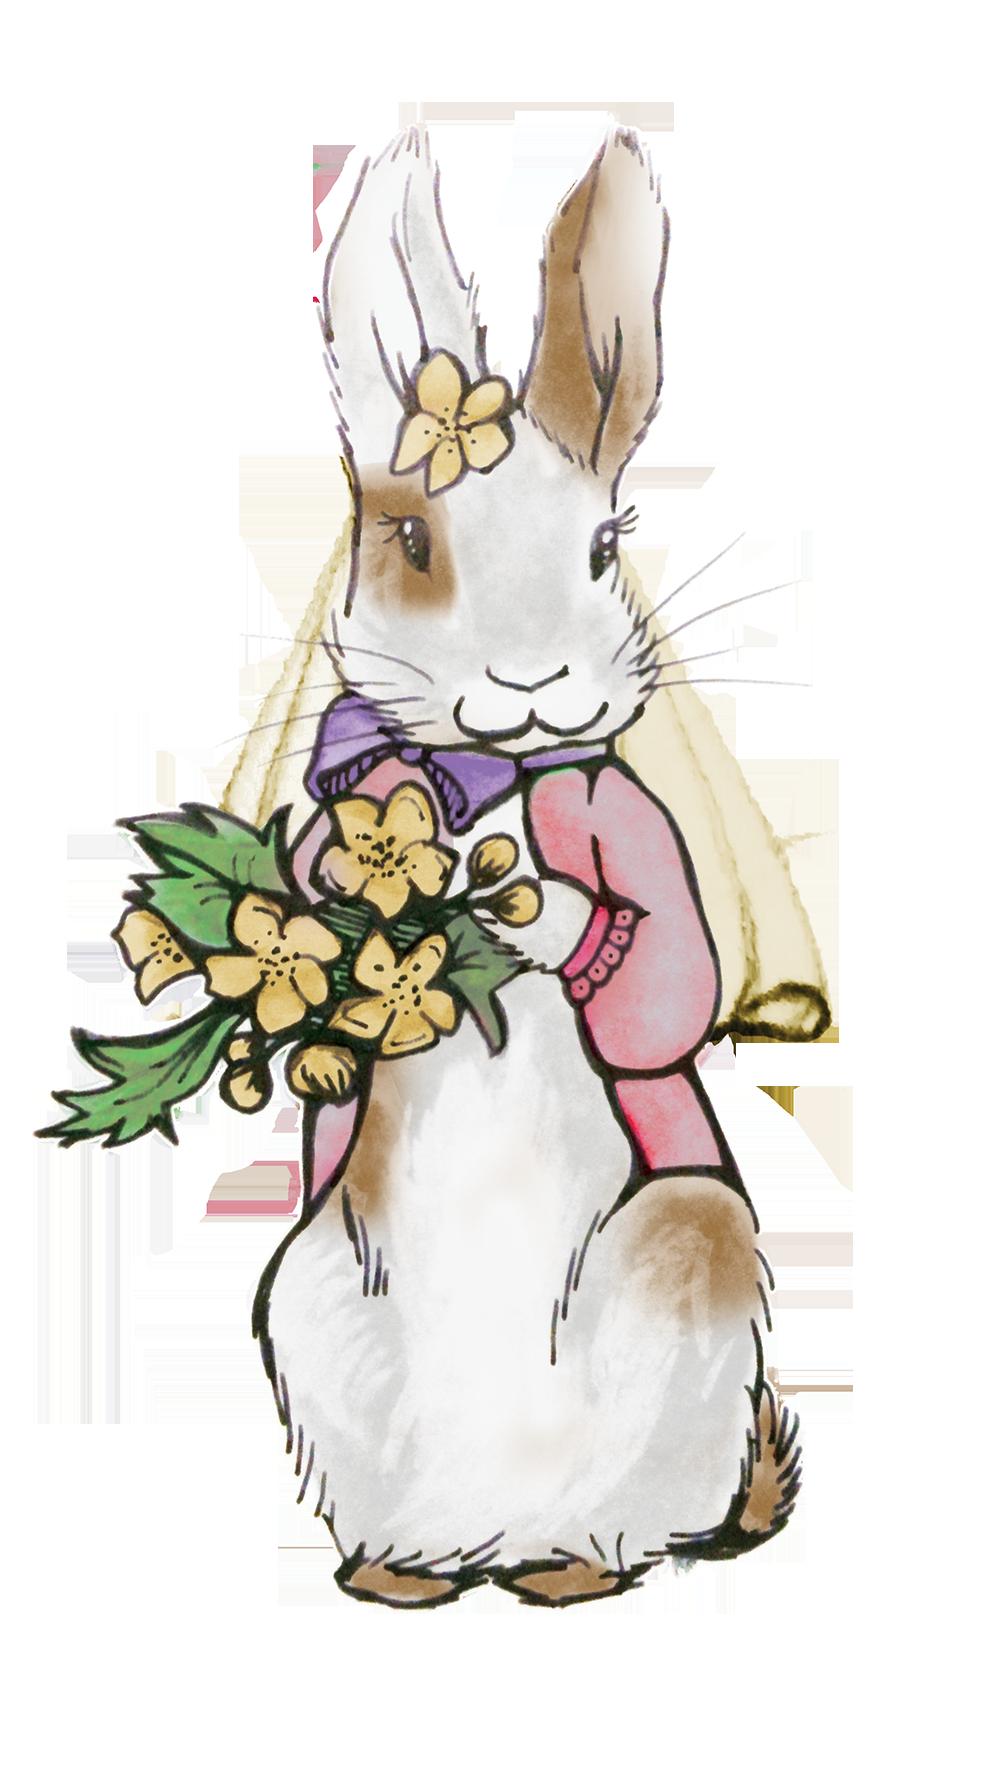 rabbit cartoon rabbits and hares hare snowshoe hare clipart - Rabbit,  Cartoon, Rabbits And Hares, transparent clip art